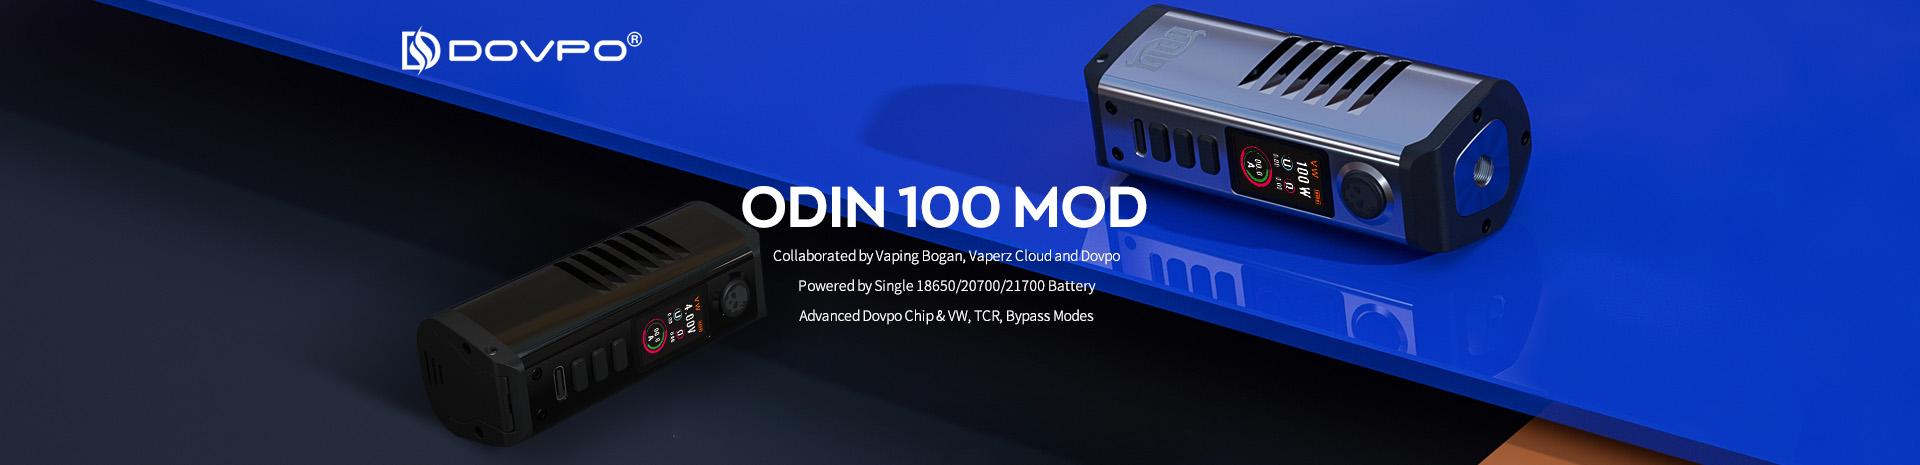 DOVPO Odin 100 Mod Bannner